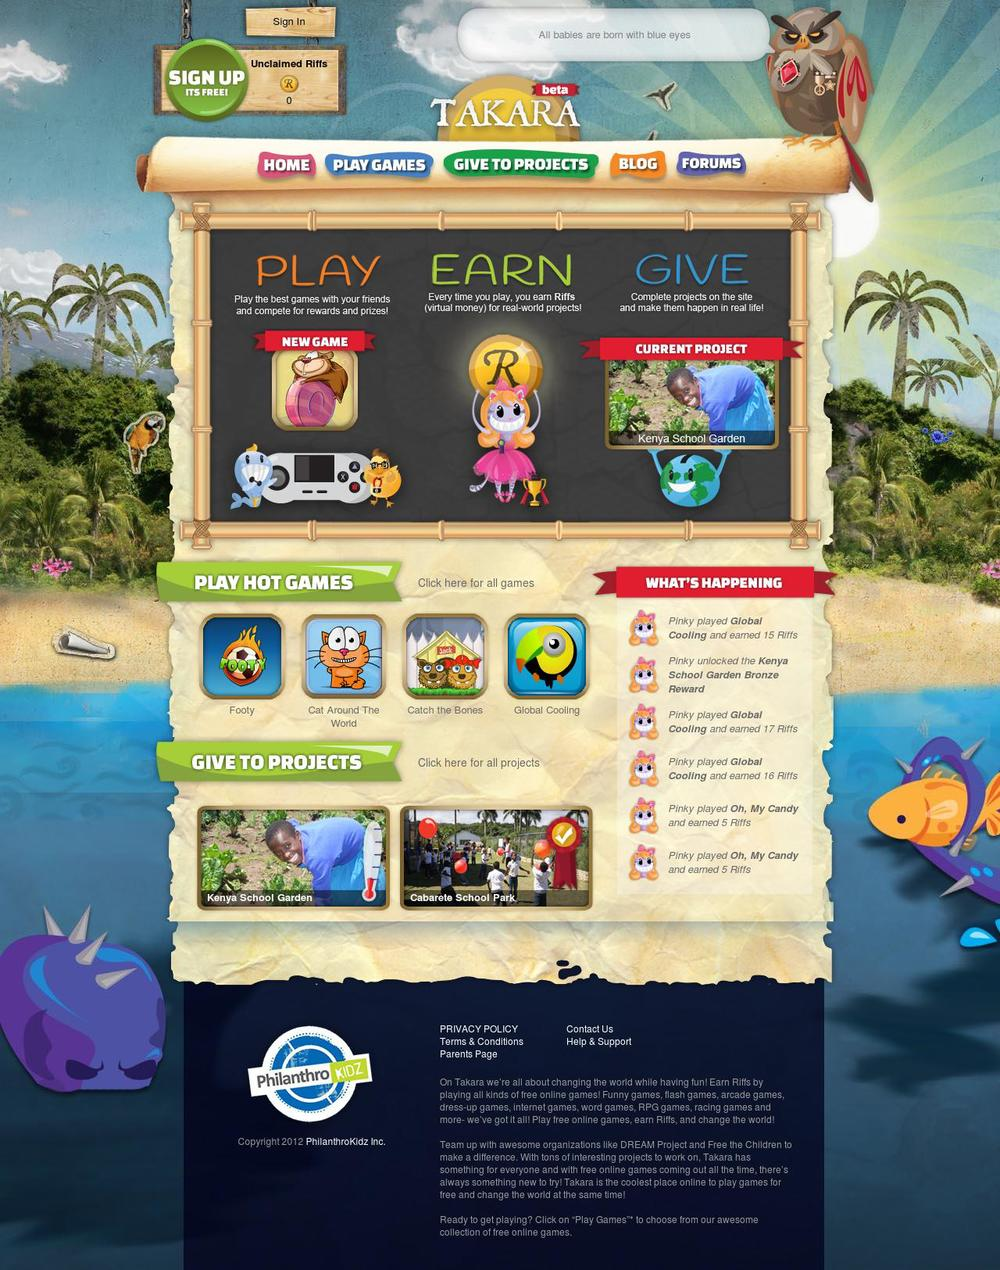 PlayTakara.com landing page